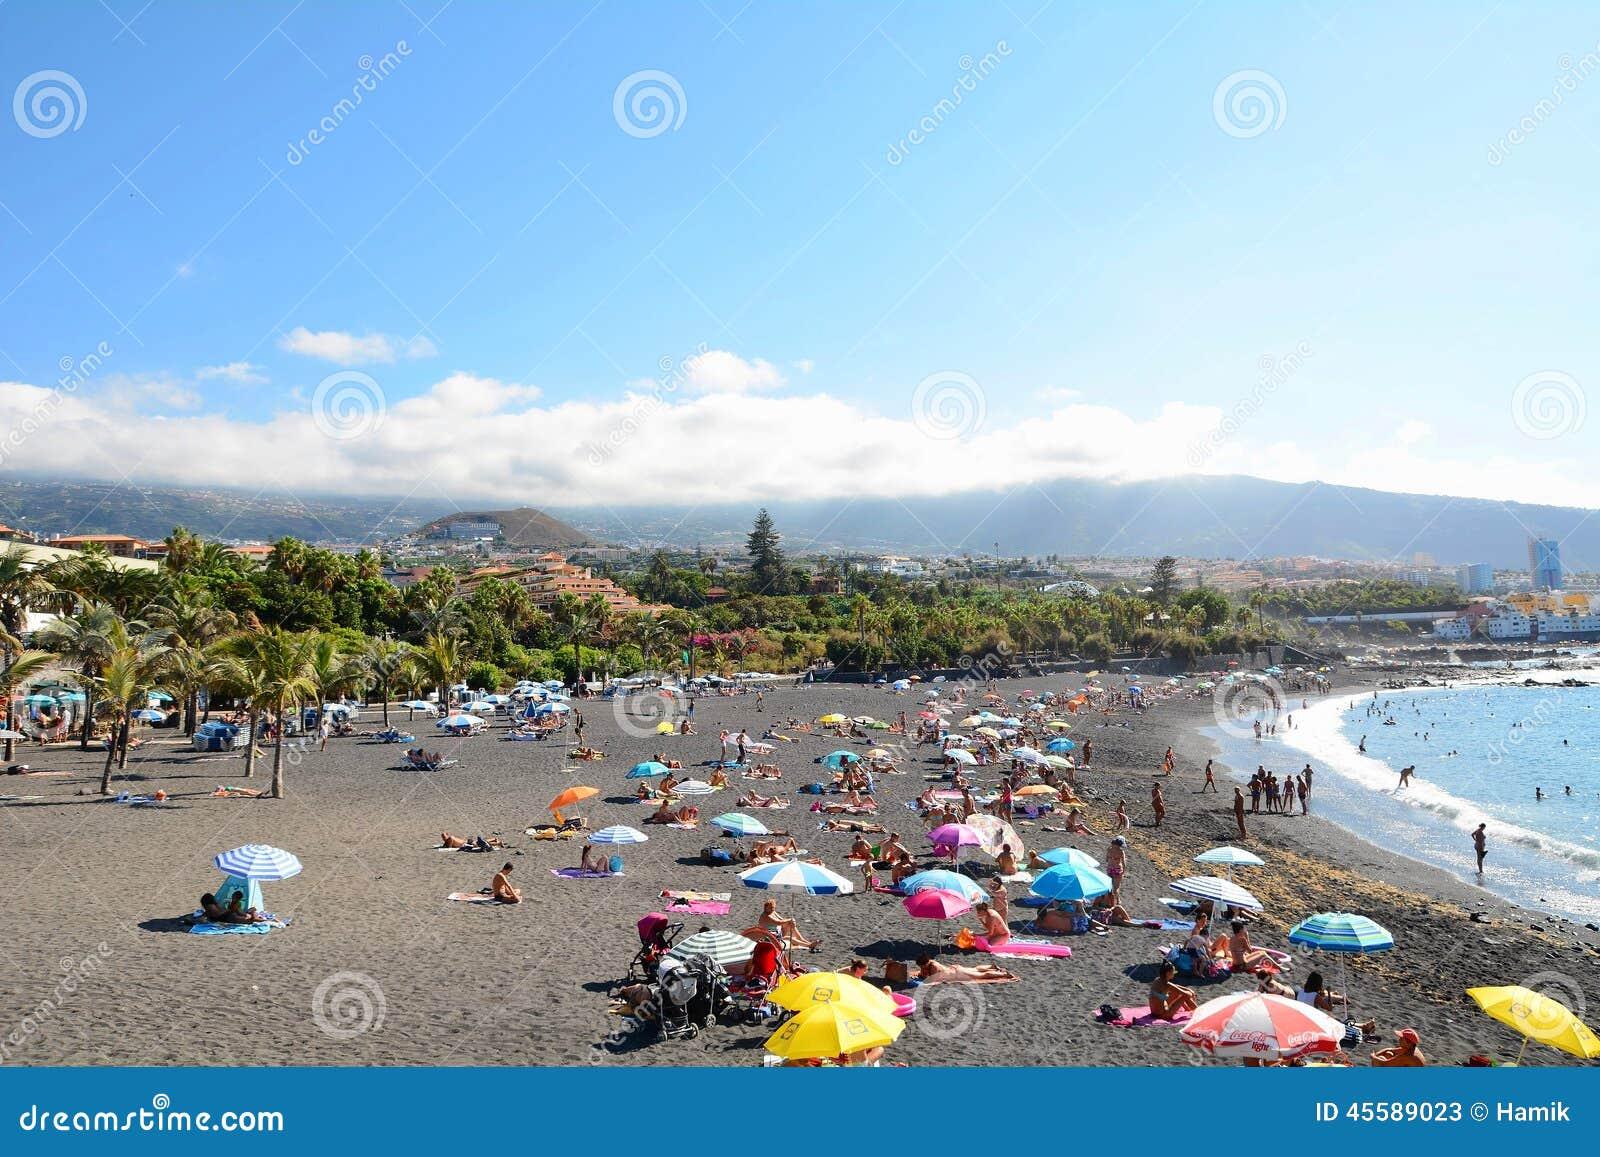 Tenerife beach editorial stock photo image 45589023 - Playa jardin puerto de la cruz tenerife ...